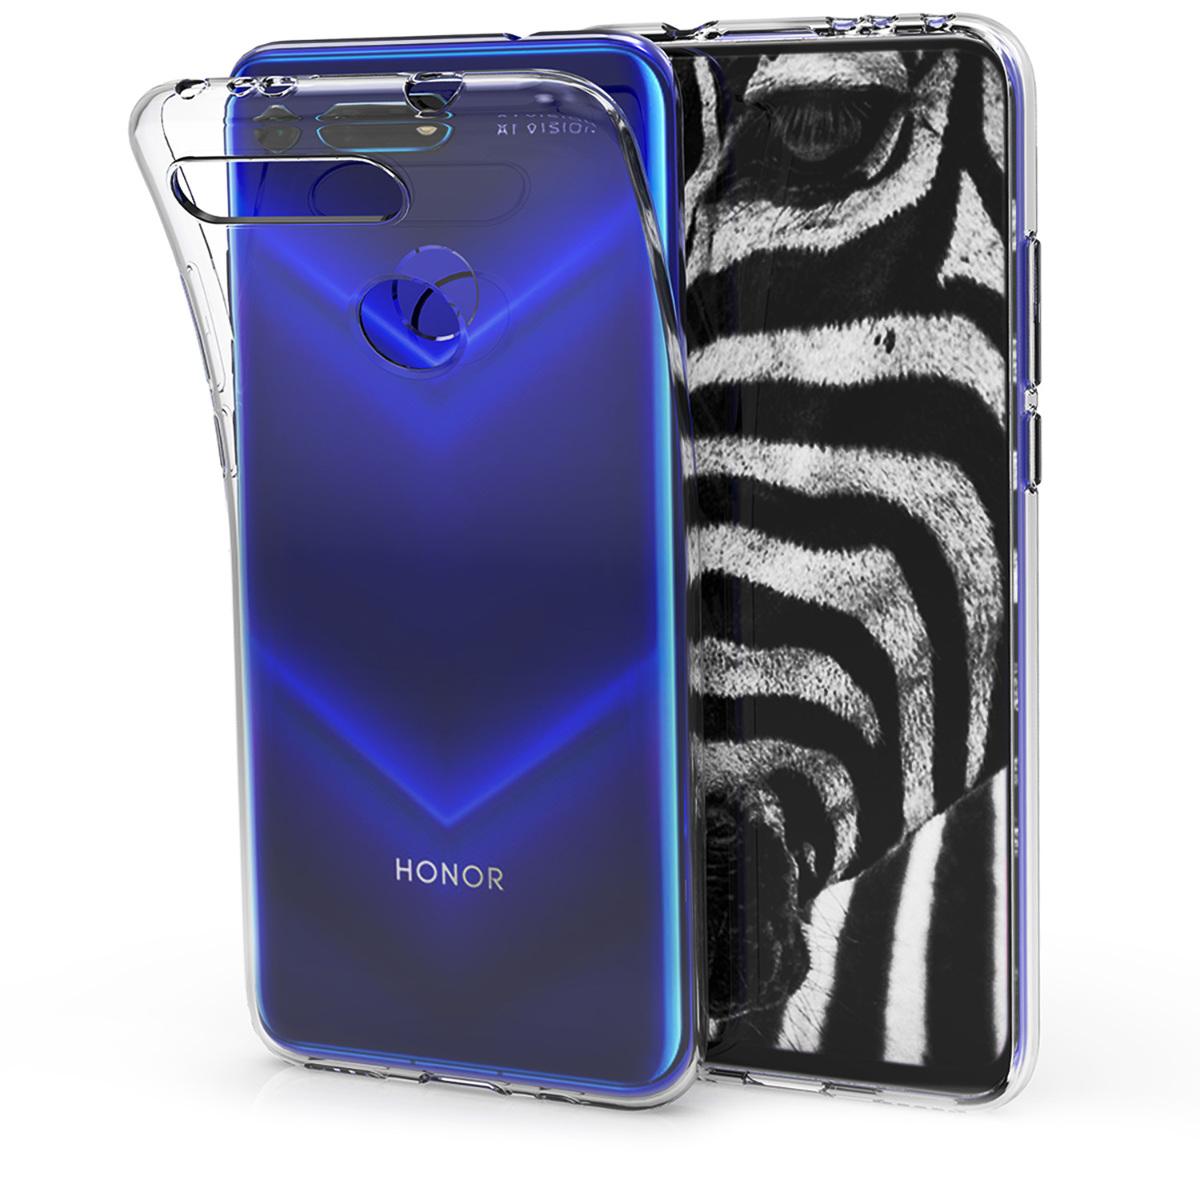 KW Διάφανη Θήκη Σιλικόνης Huawei Honor View 20 (47303.03)